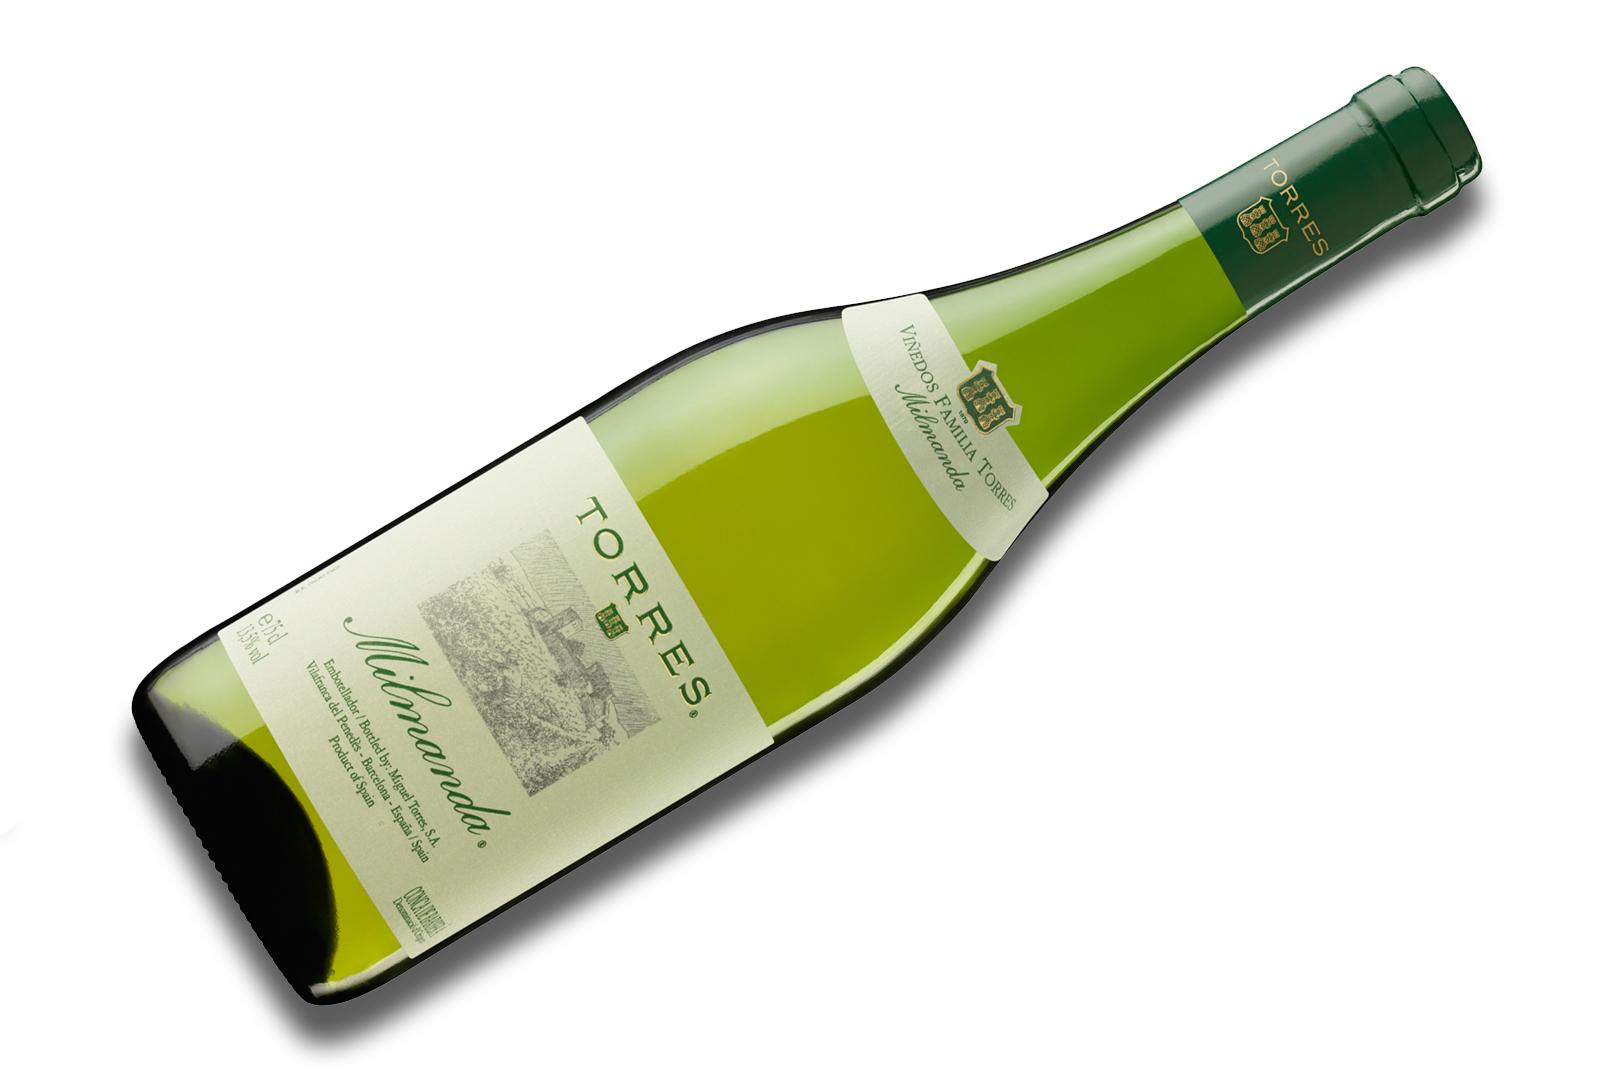 Milmanda de Bodegas Torres, el vino europeo preferido.